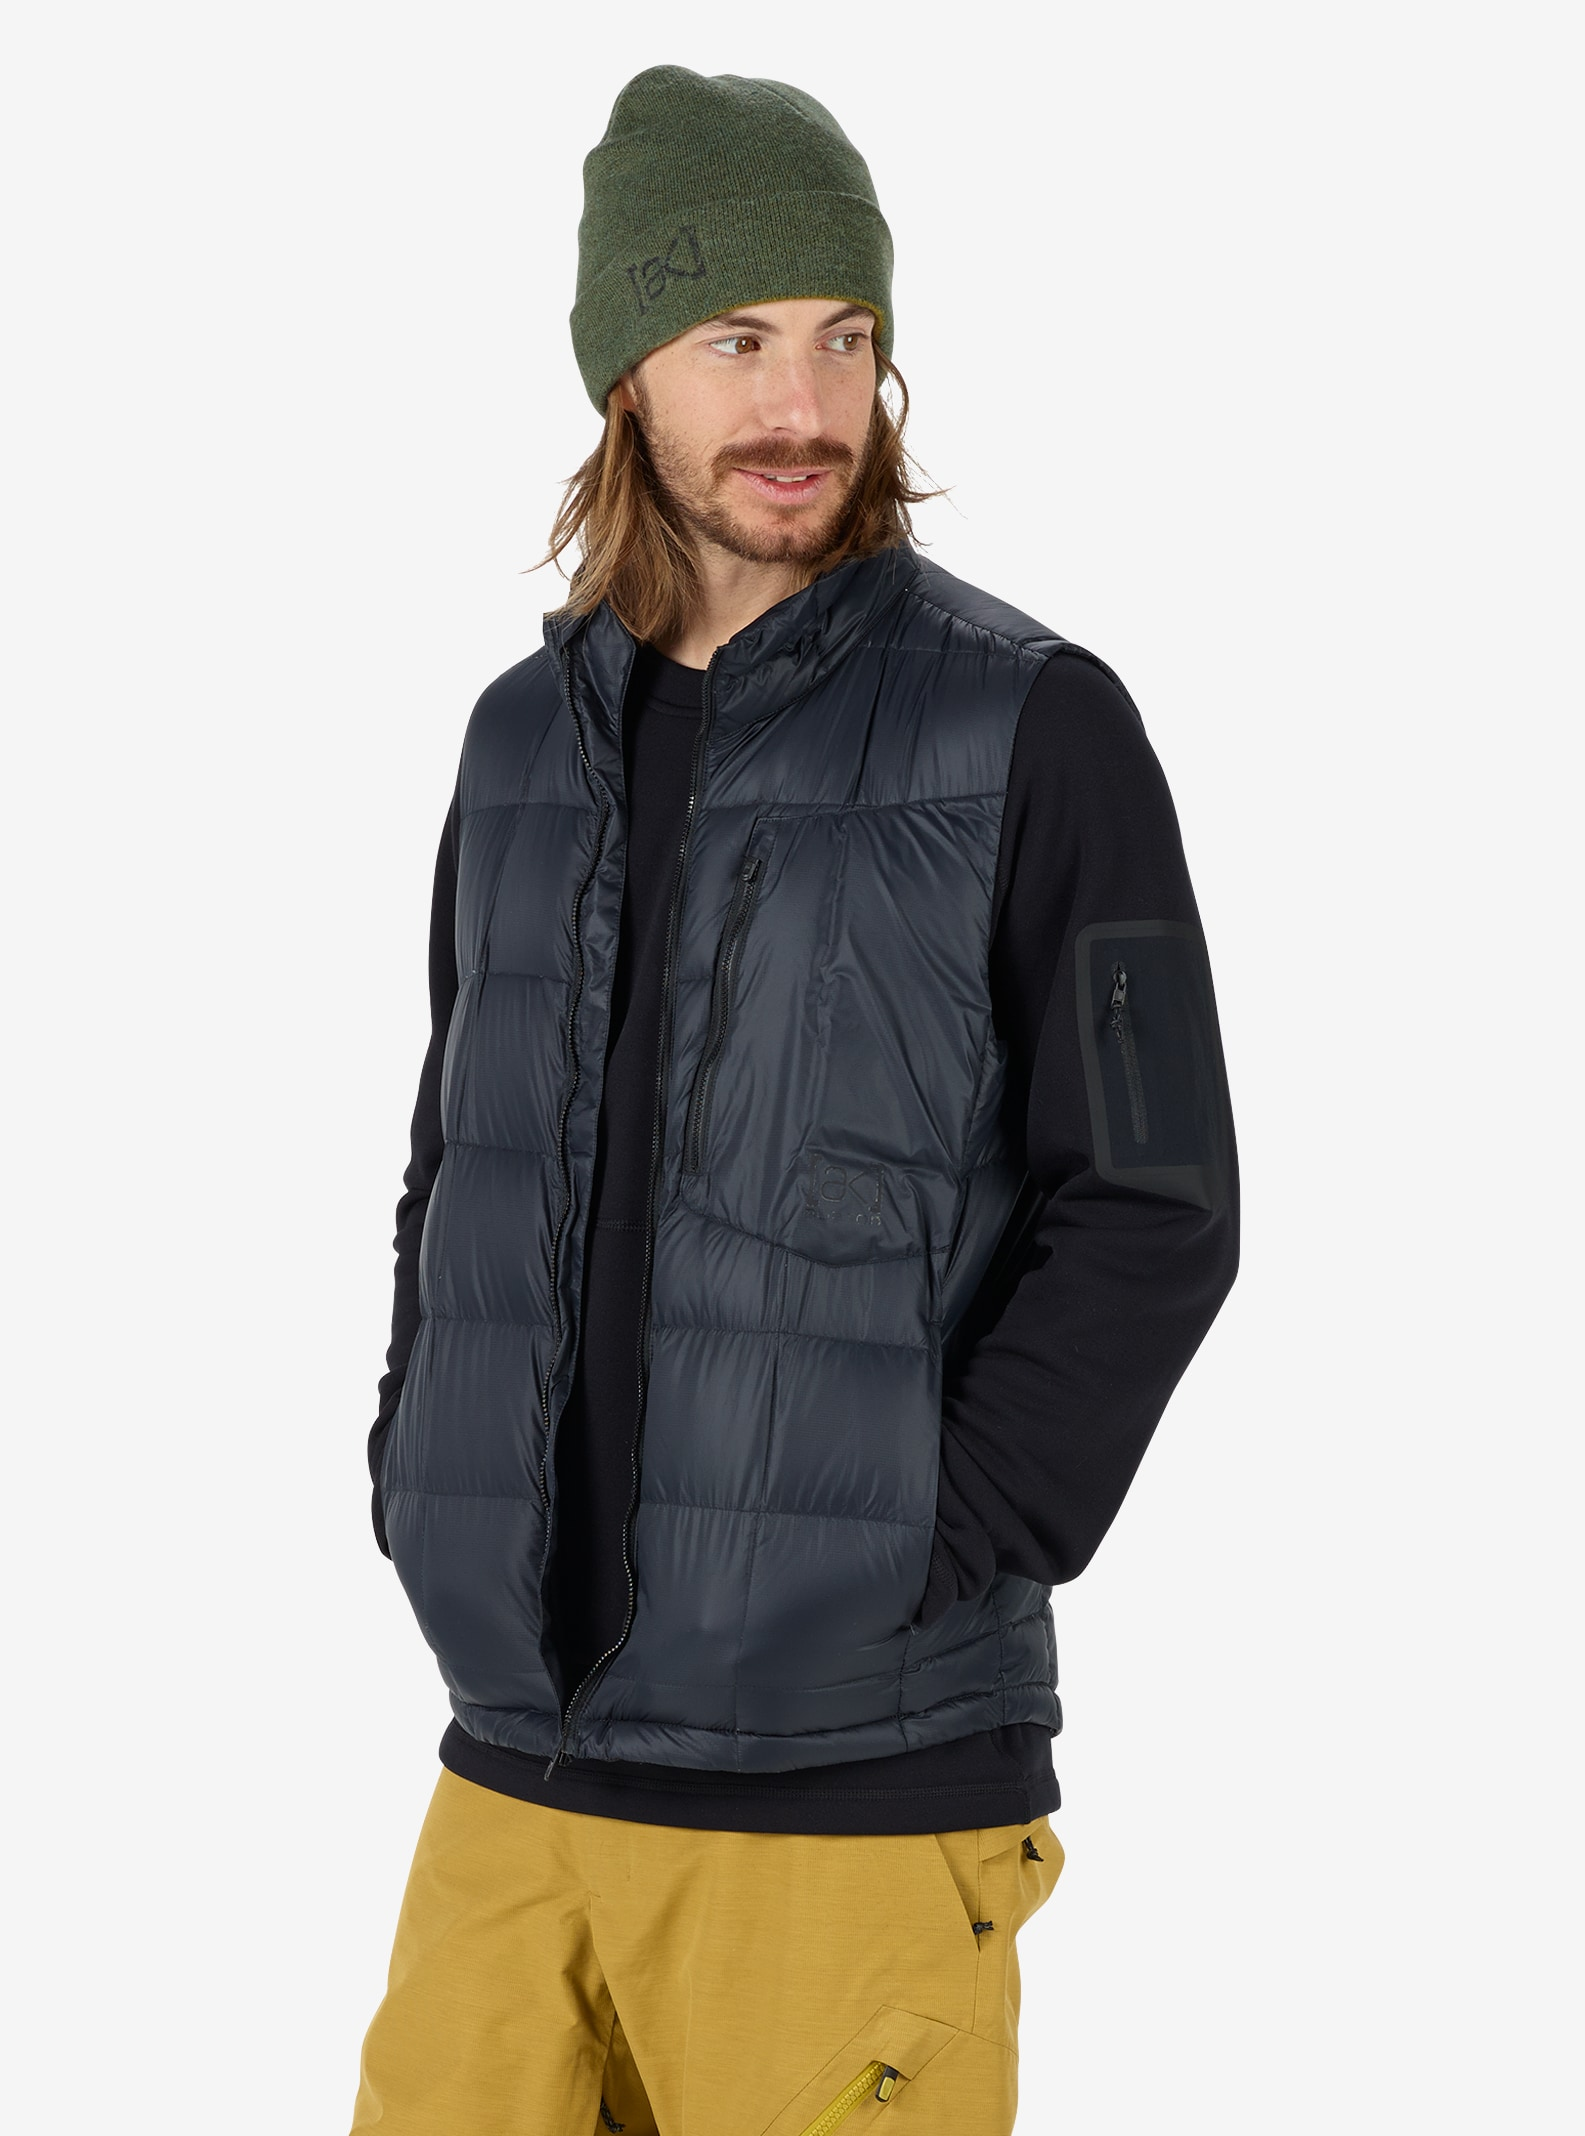 Men's Burton [ak] BK Down Insulator Vest shown in True Black